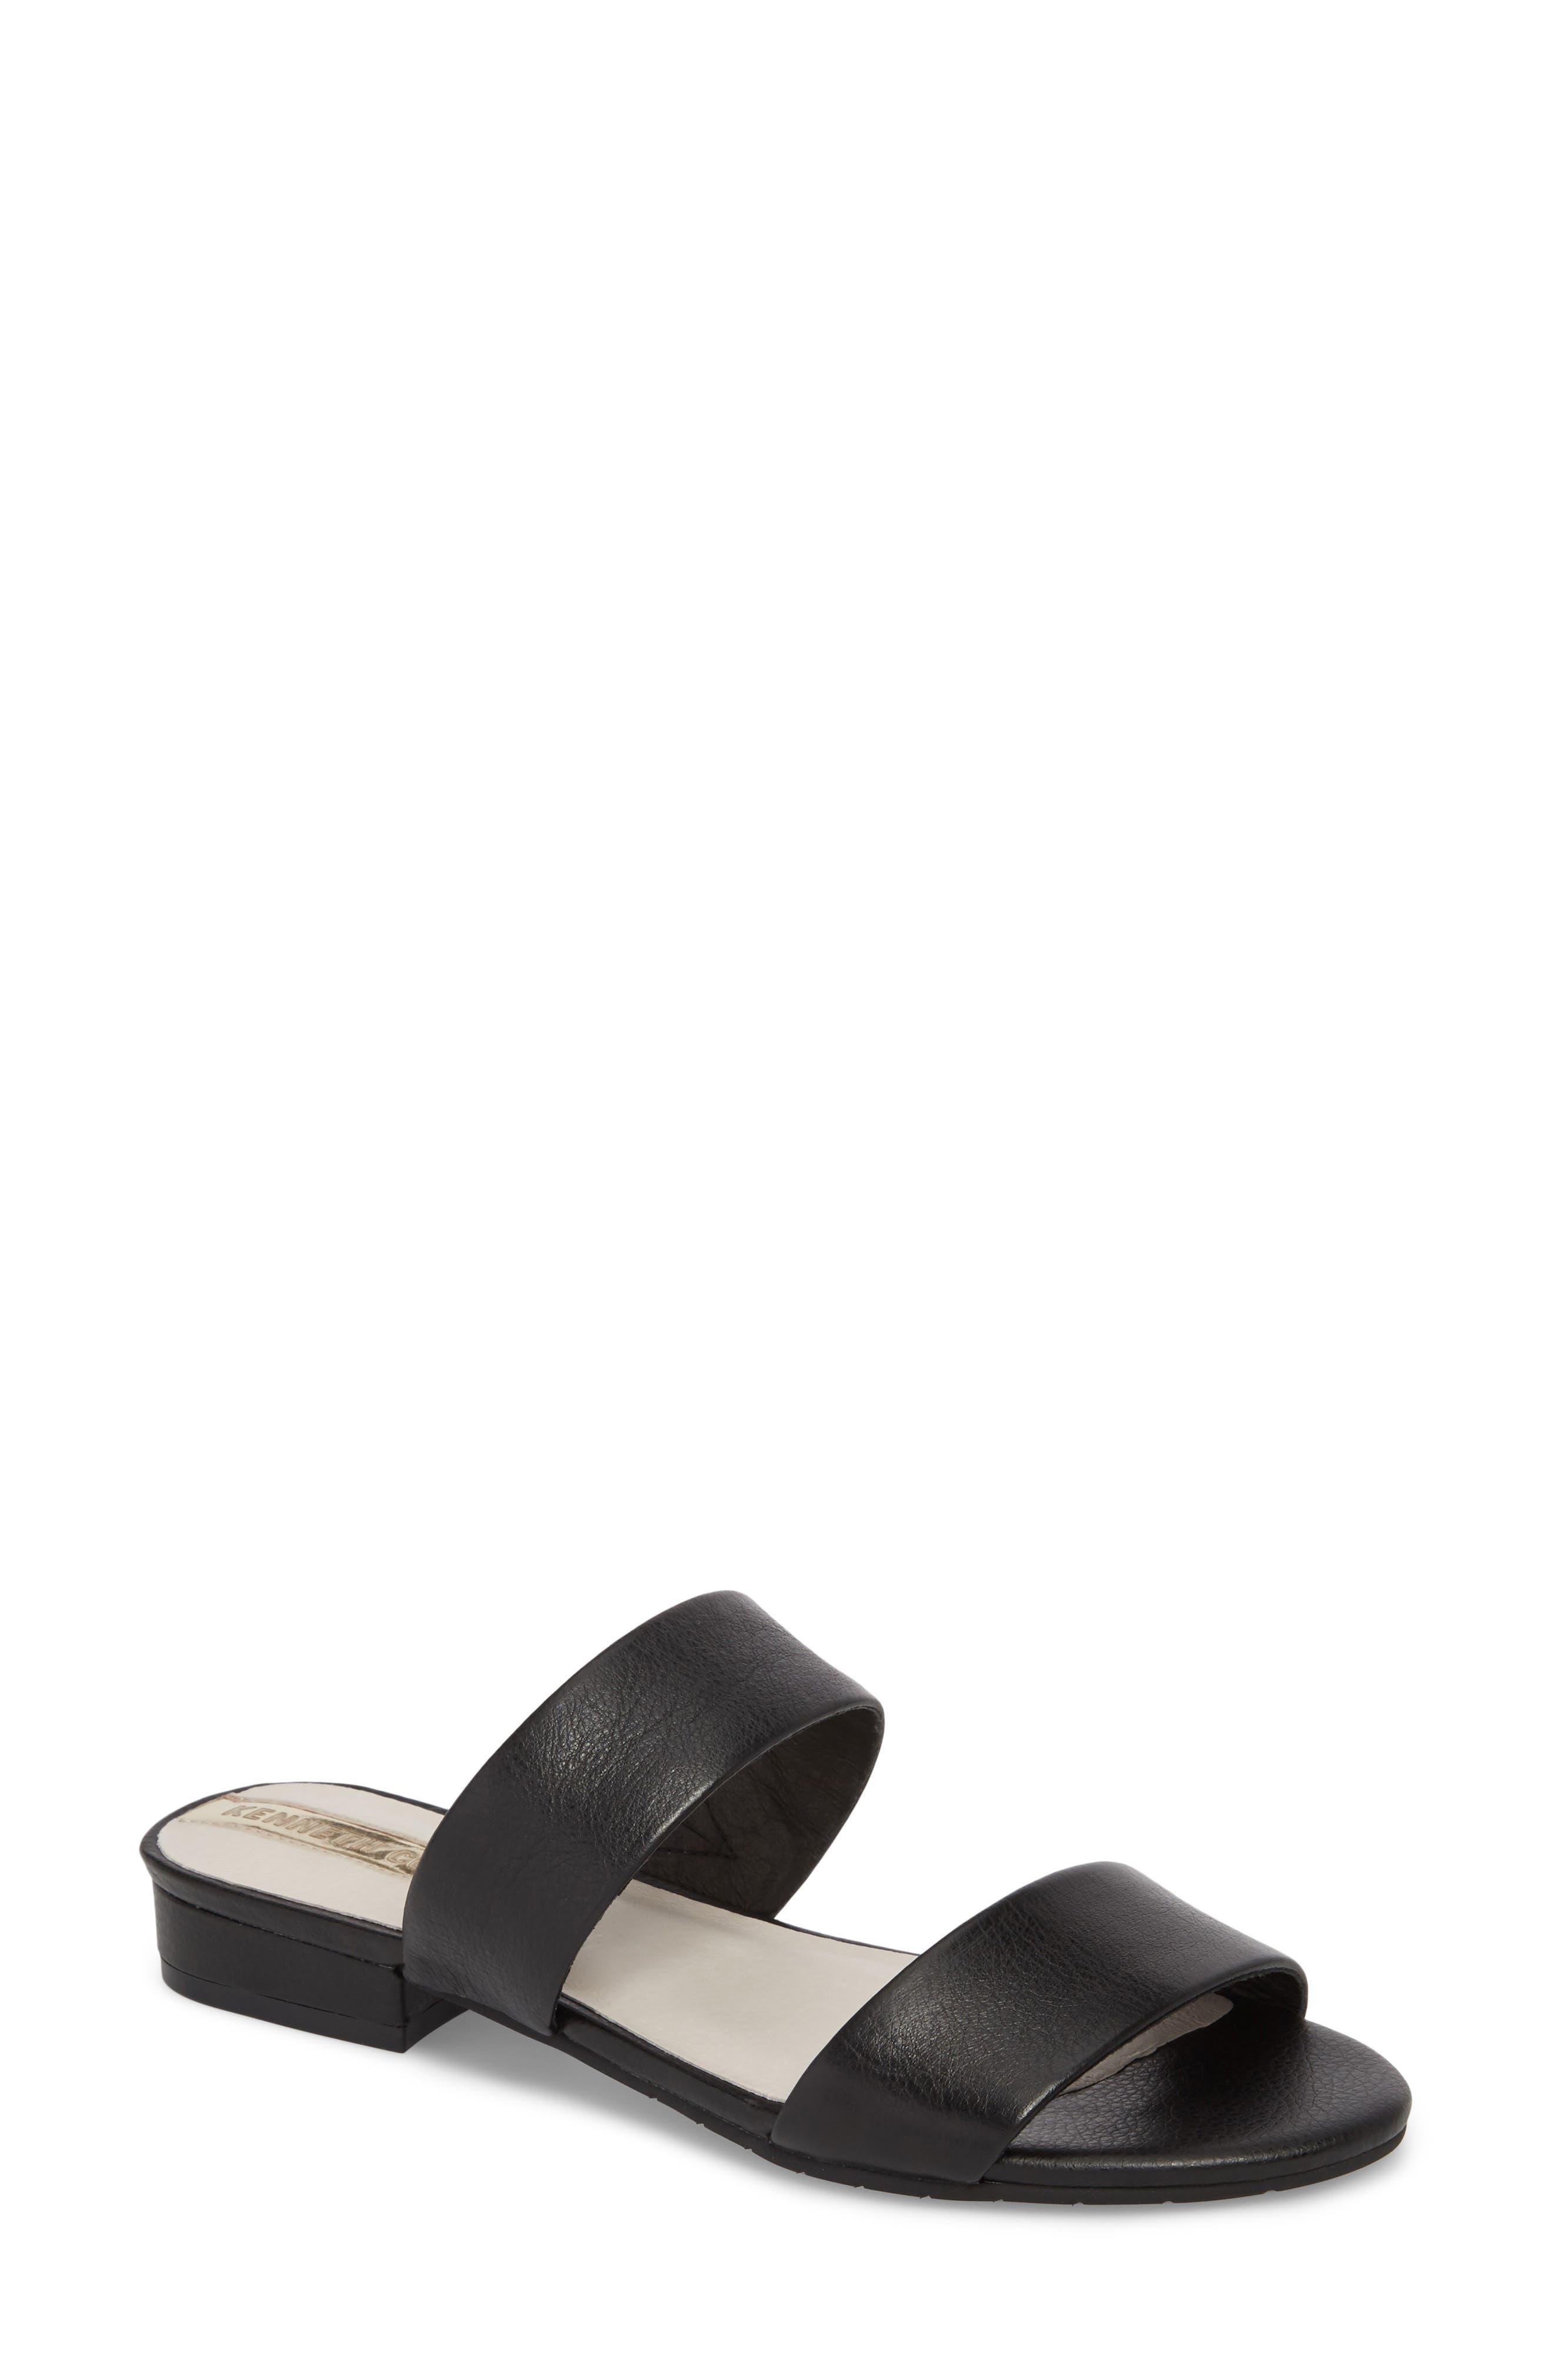 Viola Sandal,                         Main,                         color, Black Leather